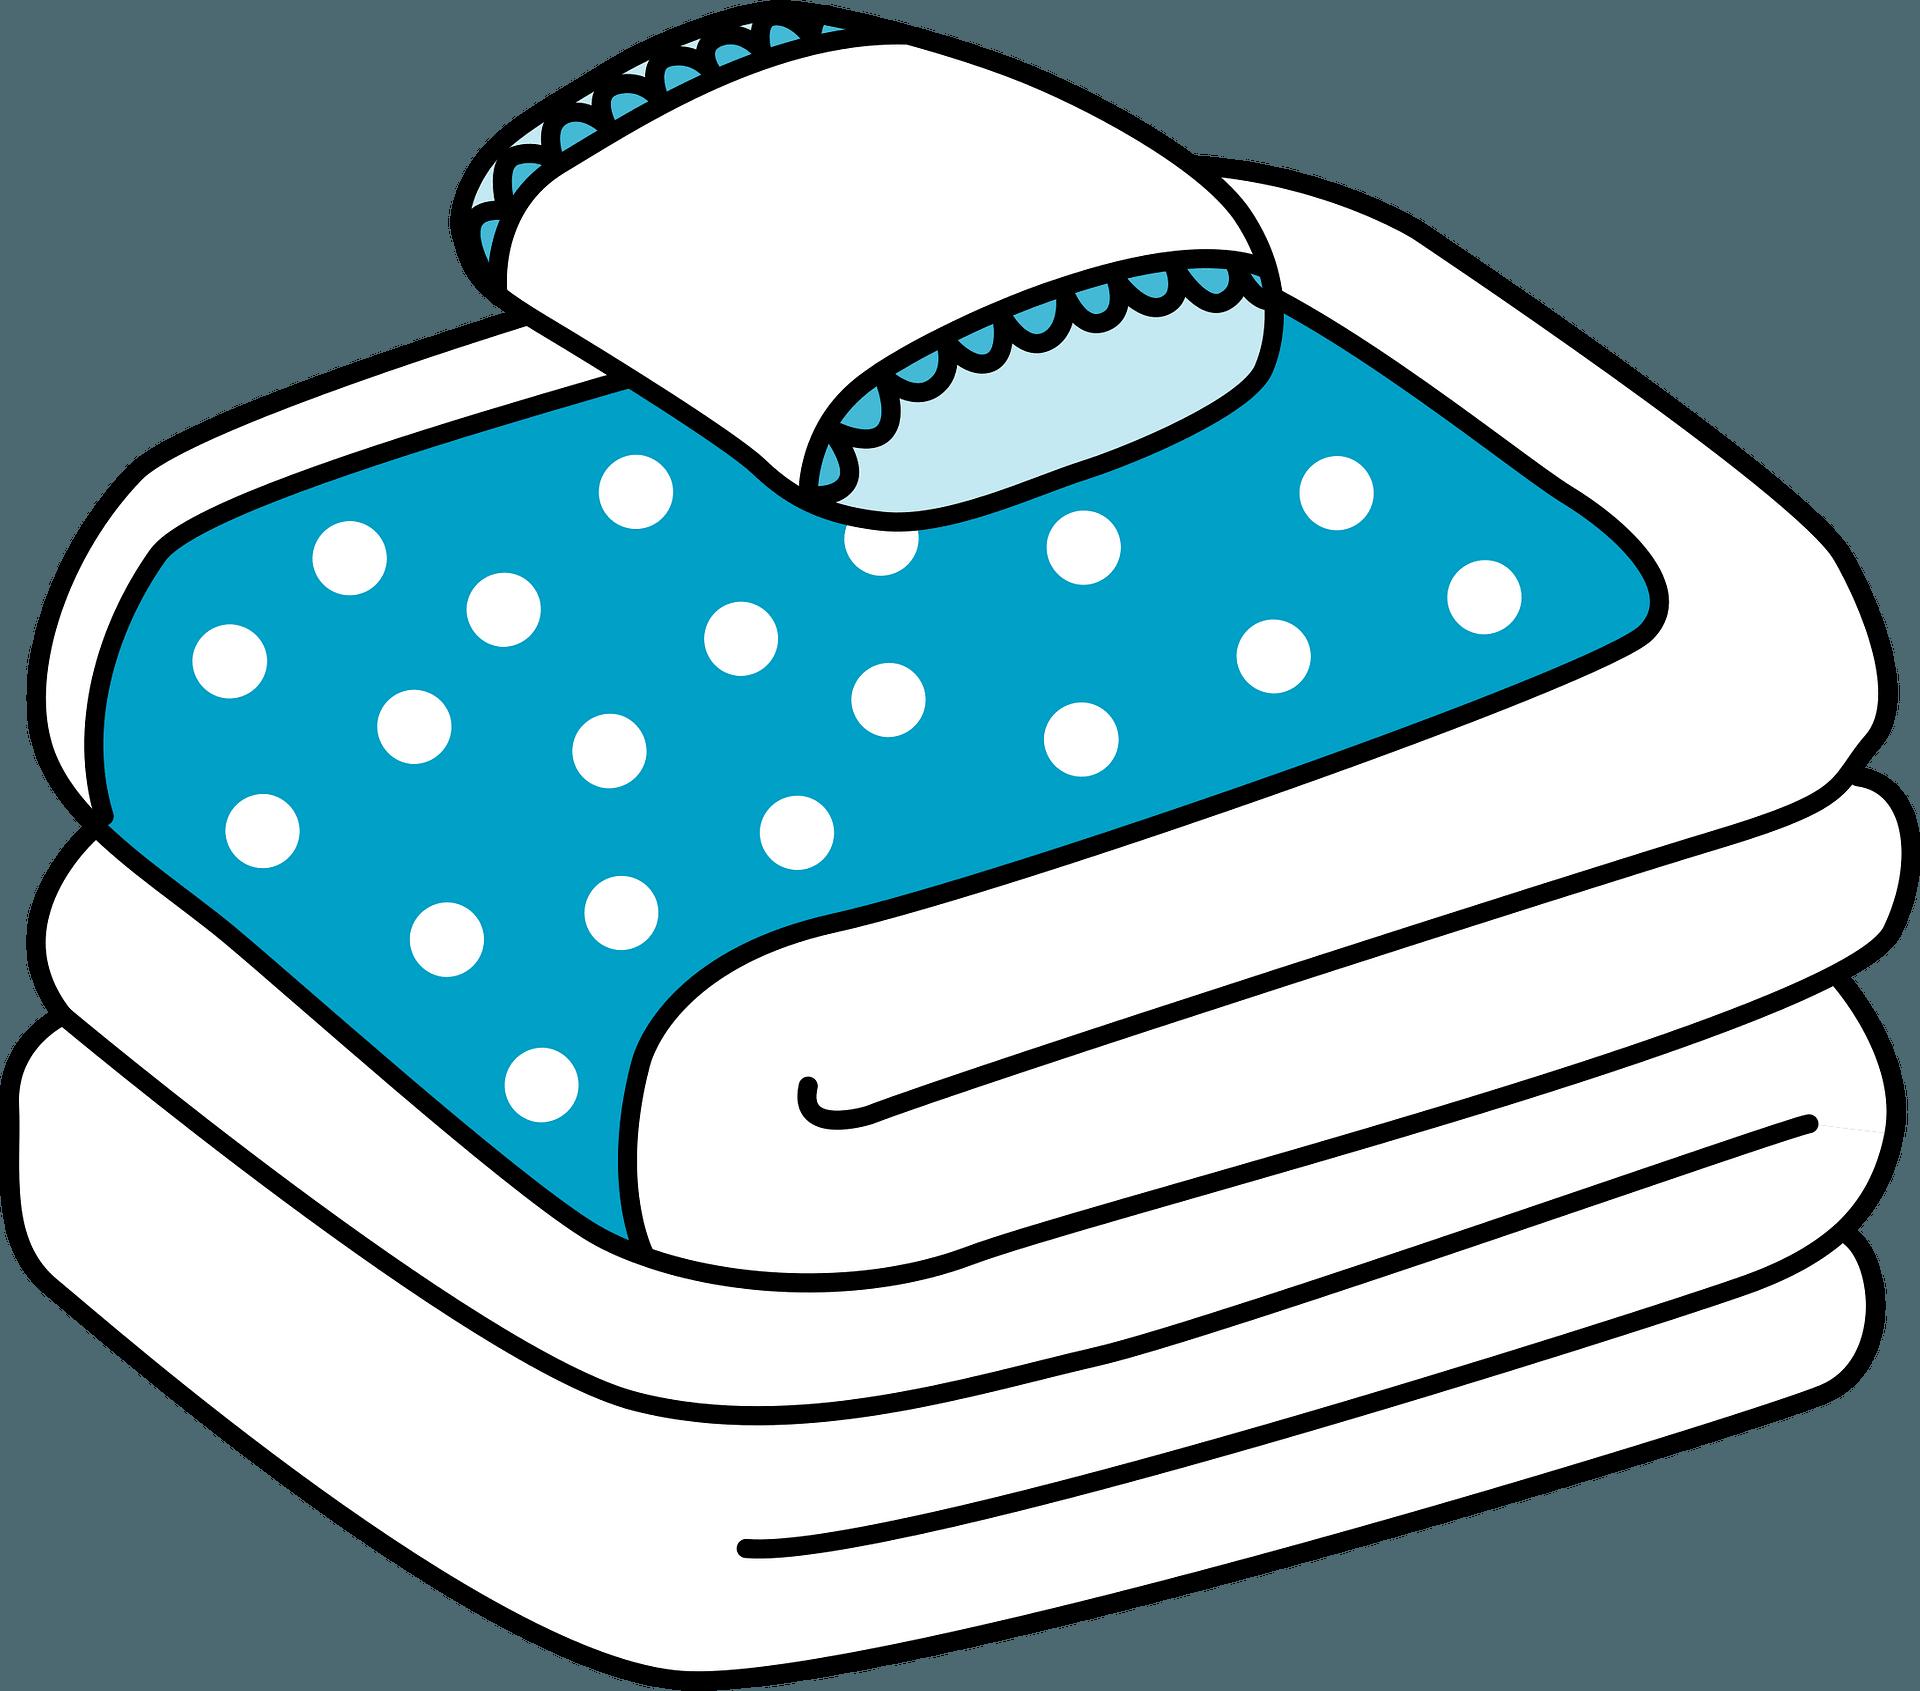 futon pillow clipart free download transparent png creazilla futon pillow clipart free download